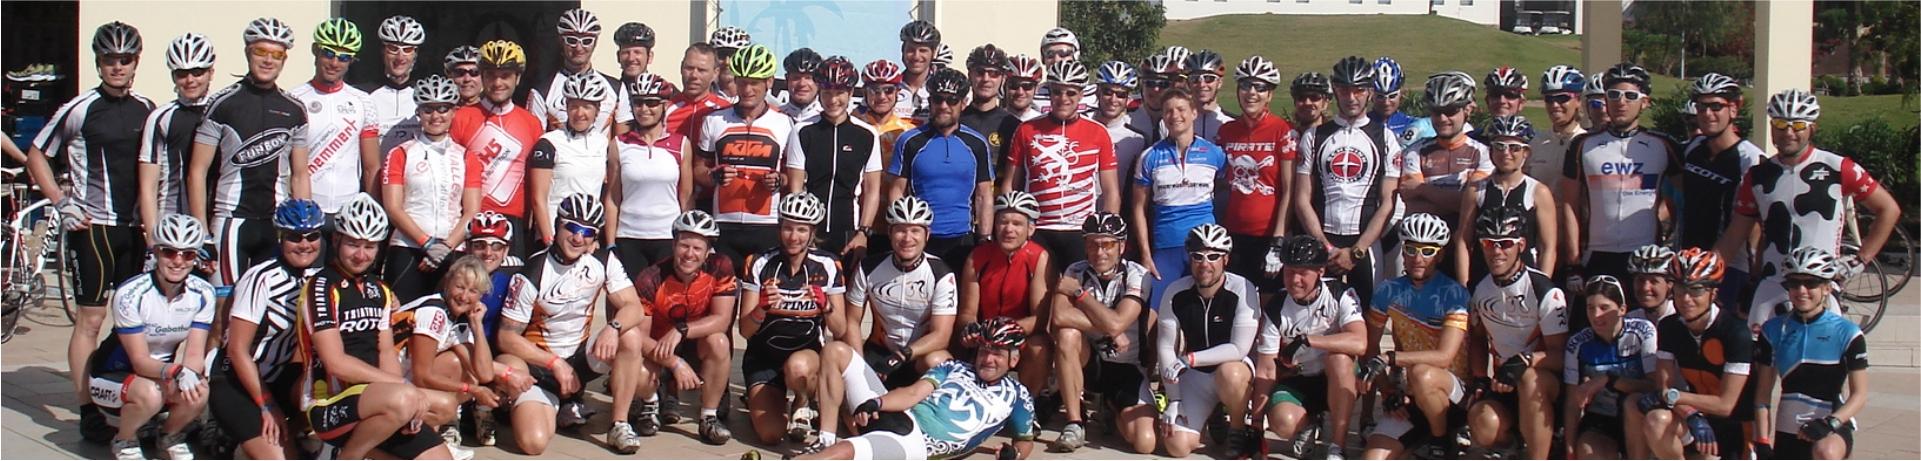 fuerte 2013 gruppe